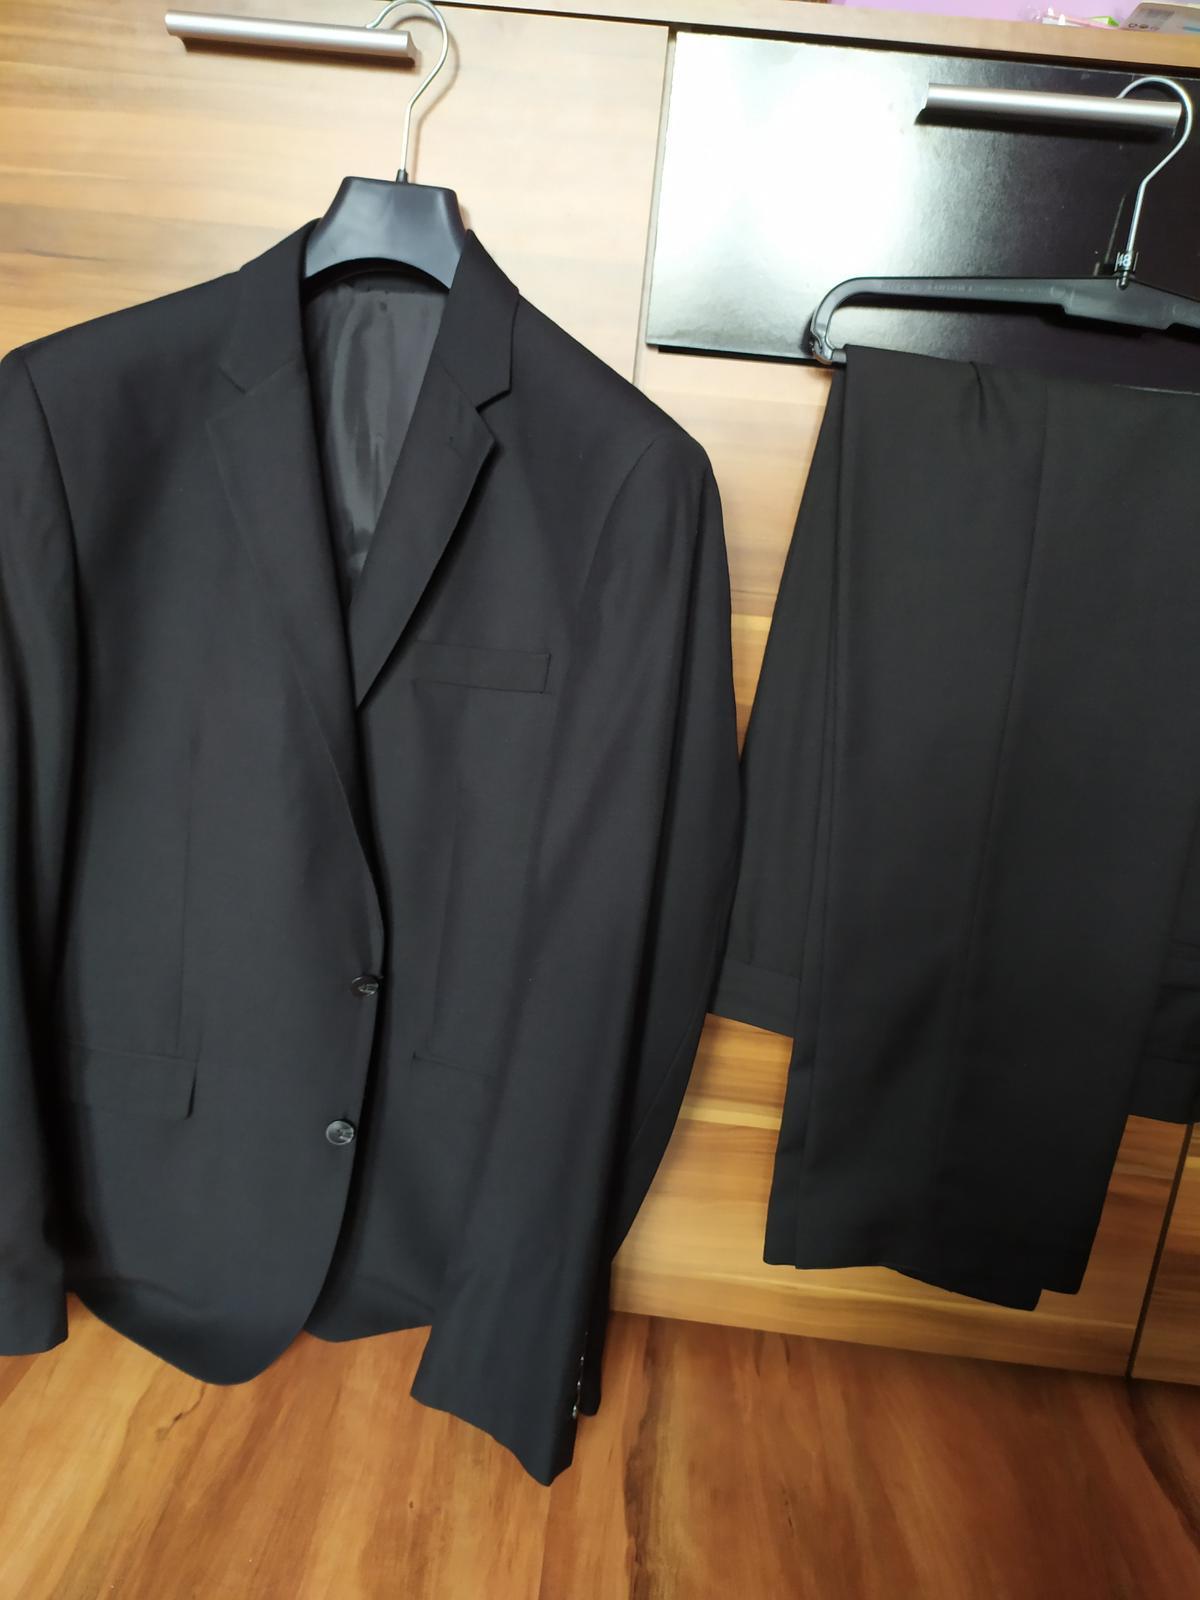 Pánský oblek Angelo Litrico, vel.50/52 - Obrázek č. 1